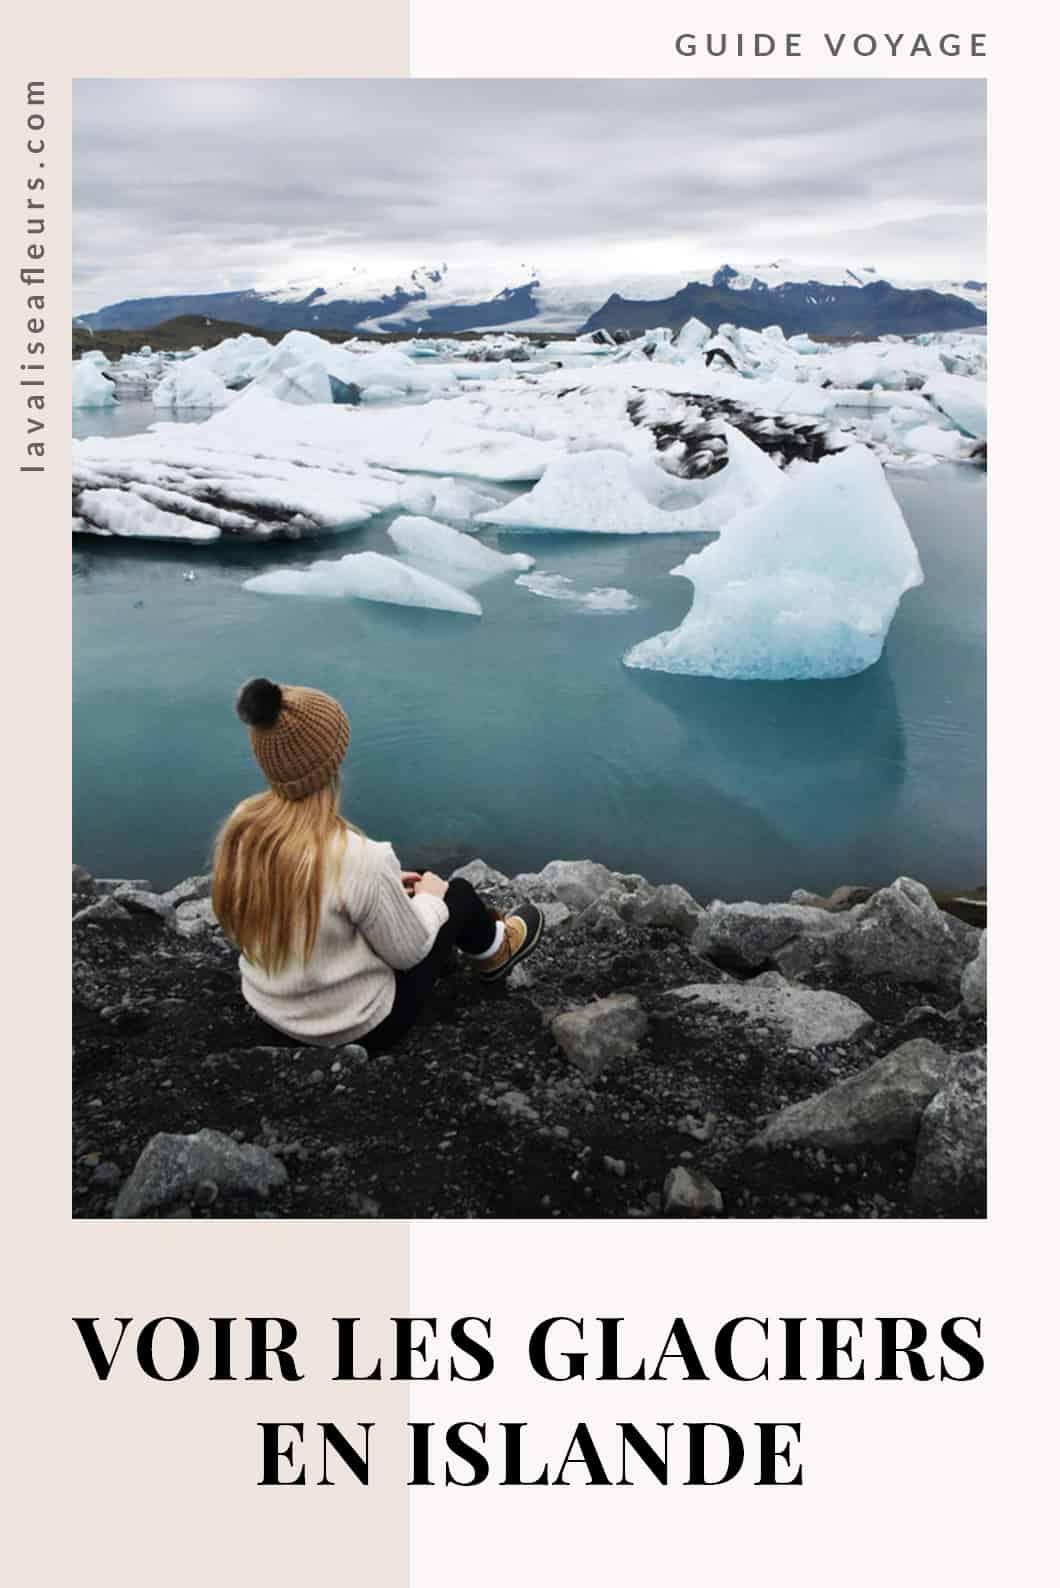 Voir les glaciers en Islande, le guide